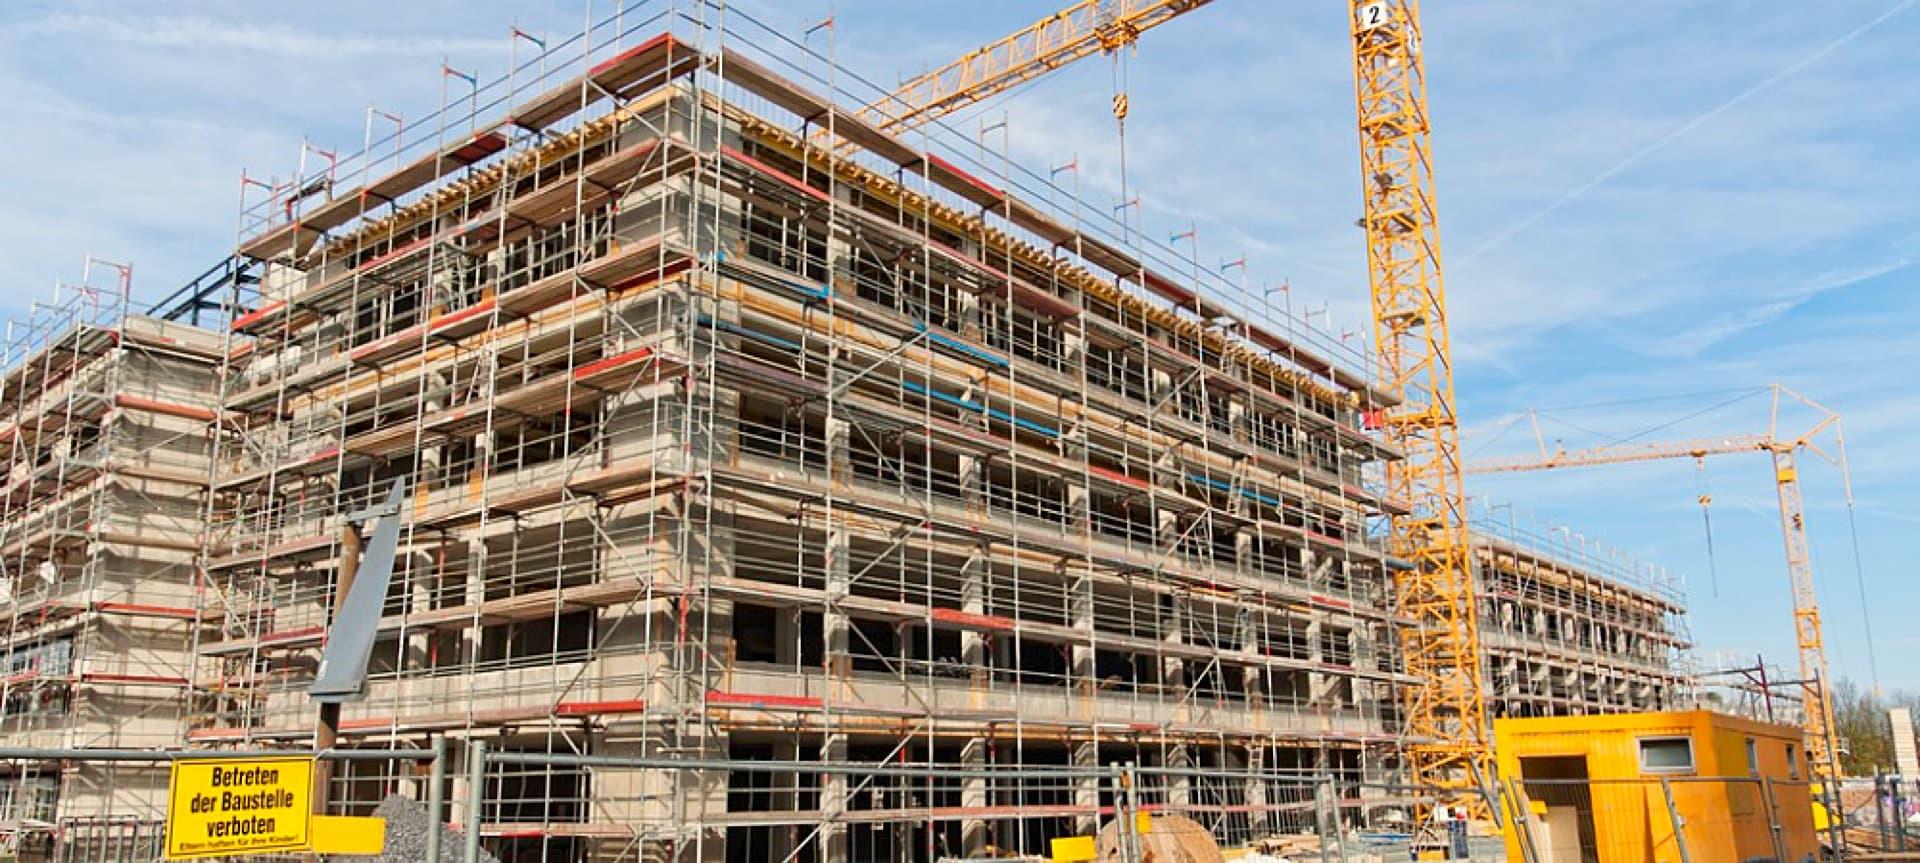 constructing building